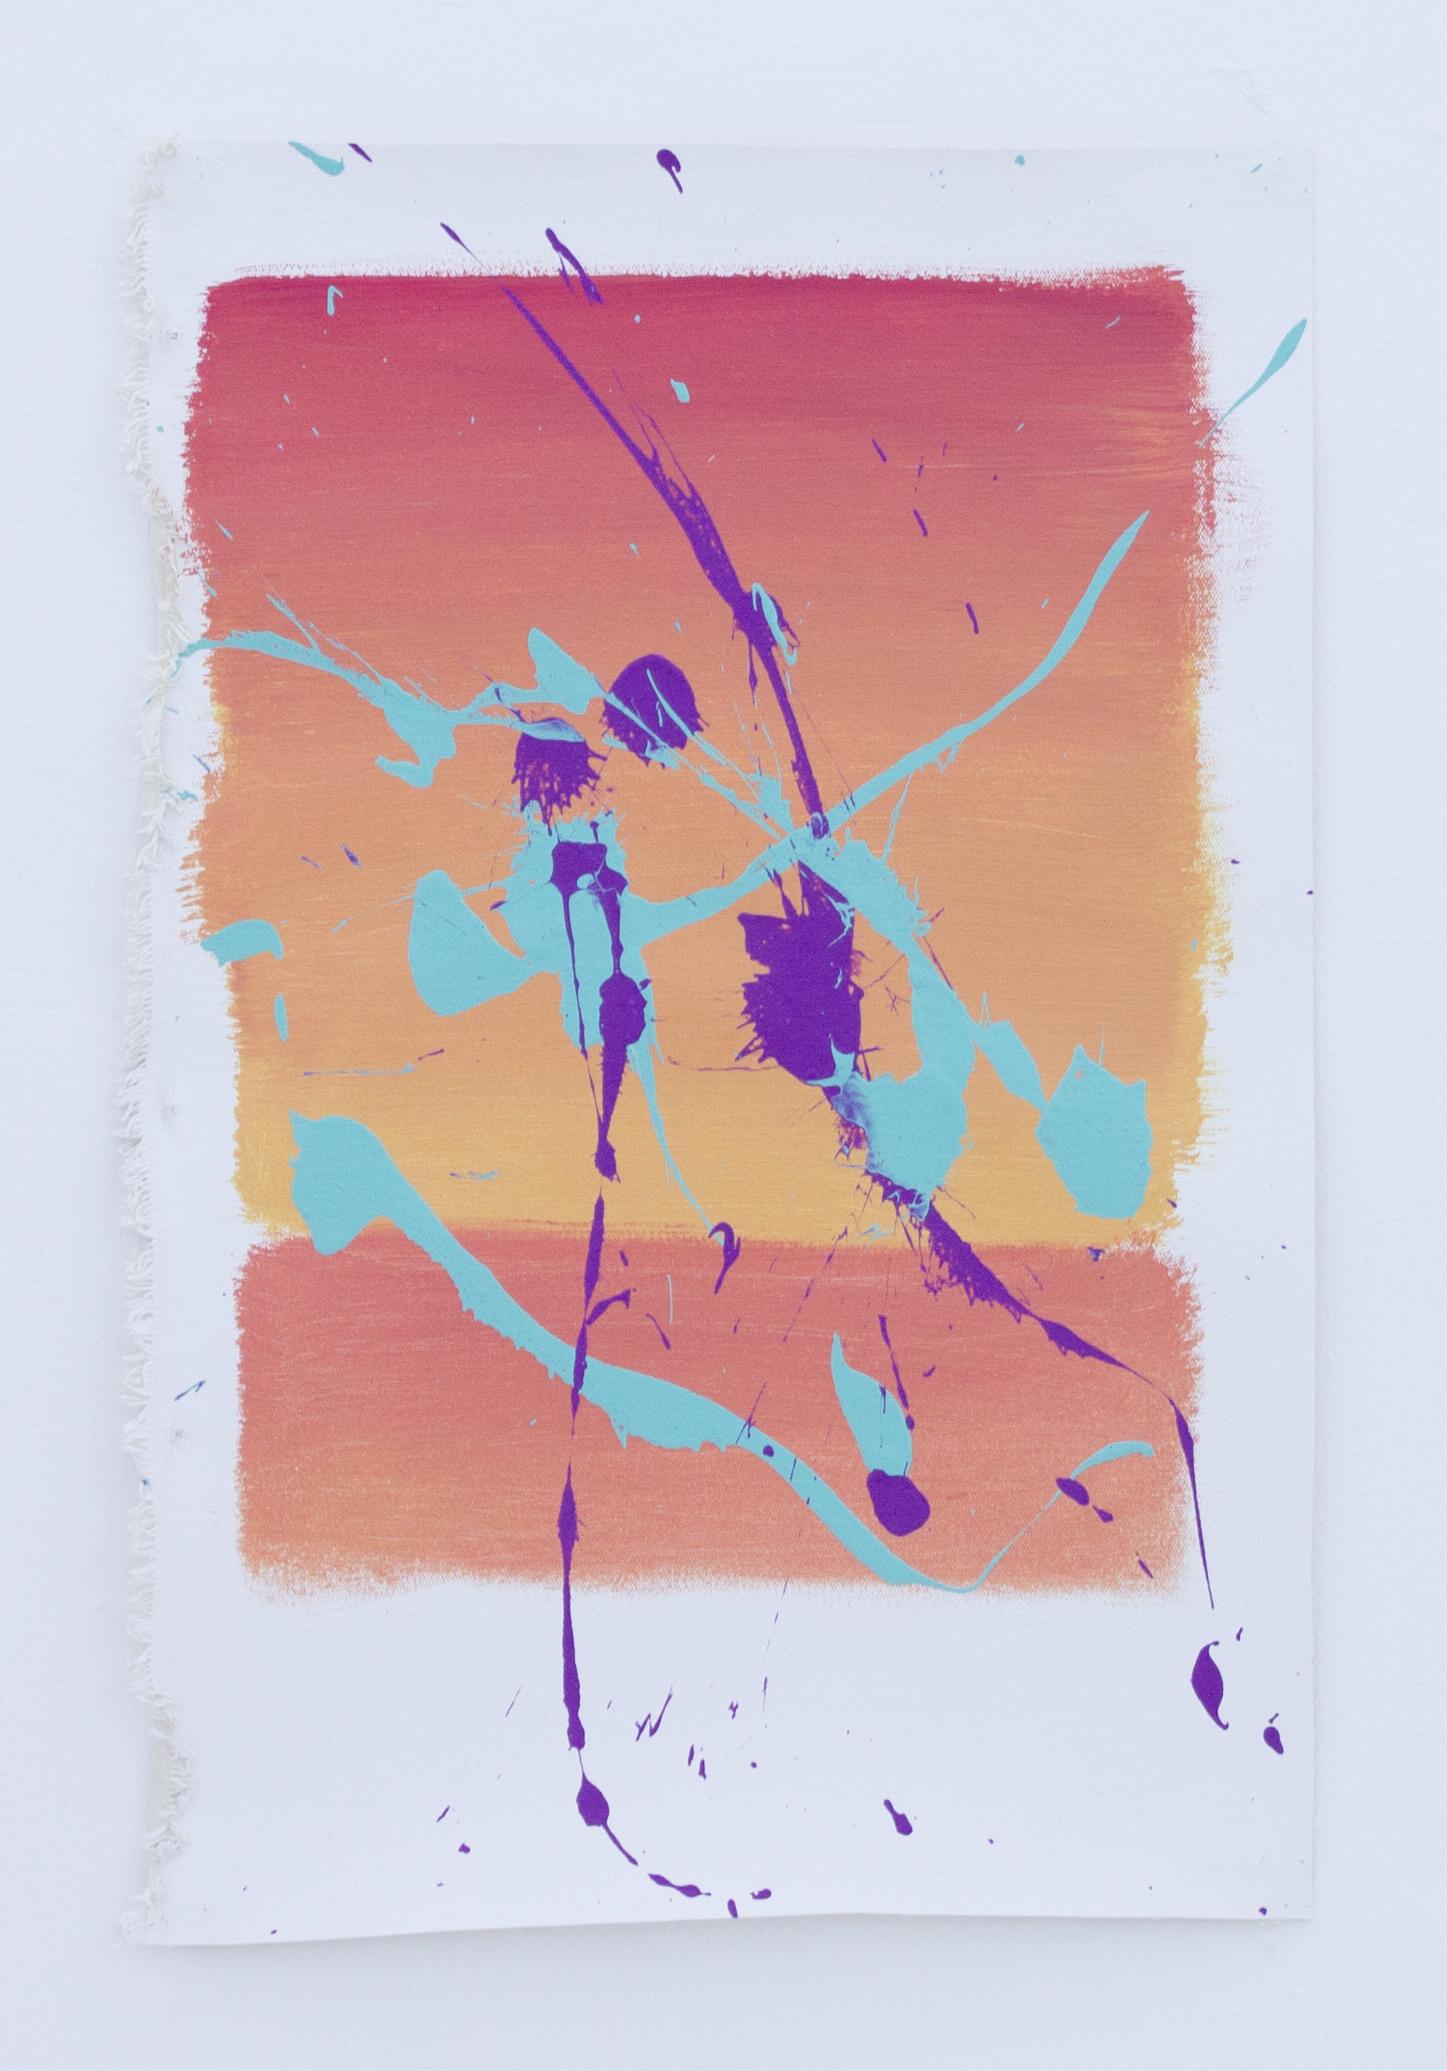 Rothko-Pollock 1   acrylic and vinyl on canvas   33 x 49 x 32.5 x 49.5 cm 2012